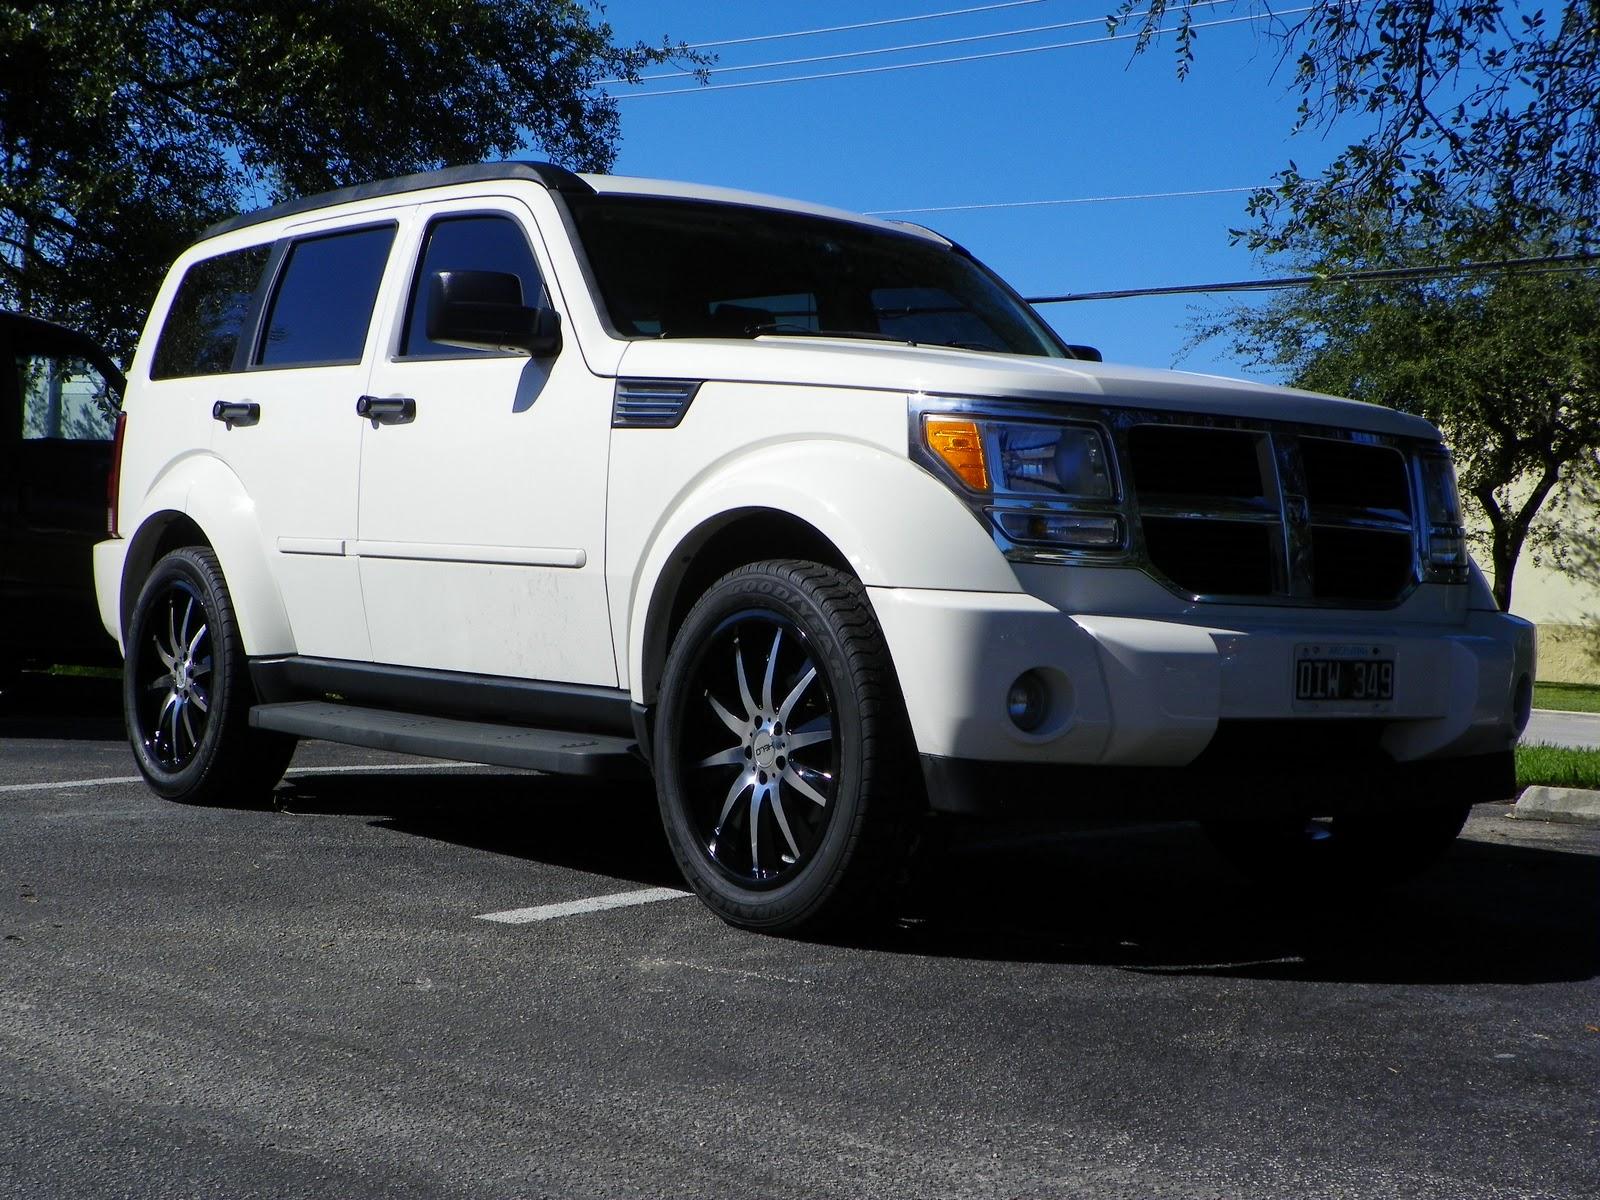 2007 dodge nitro rt specs car reviews 2018 gwt motoring wheels tires more 2007 dodge nitro with 20 publicscrutiny Images